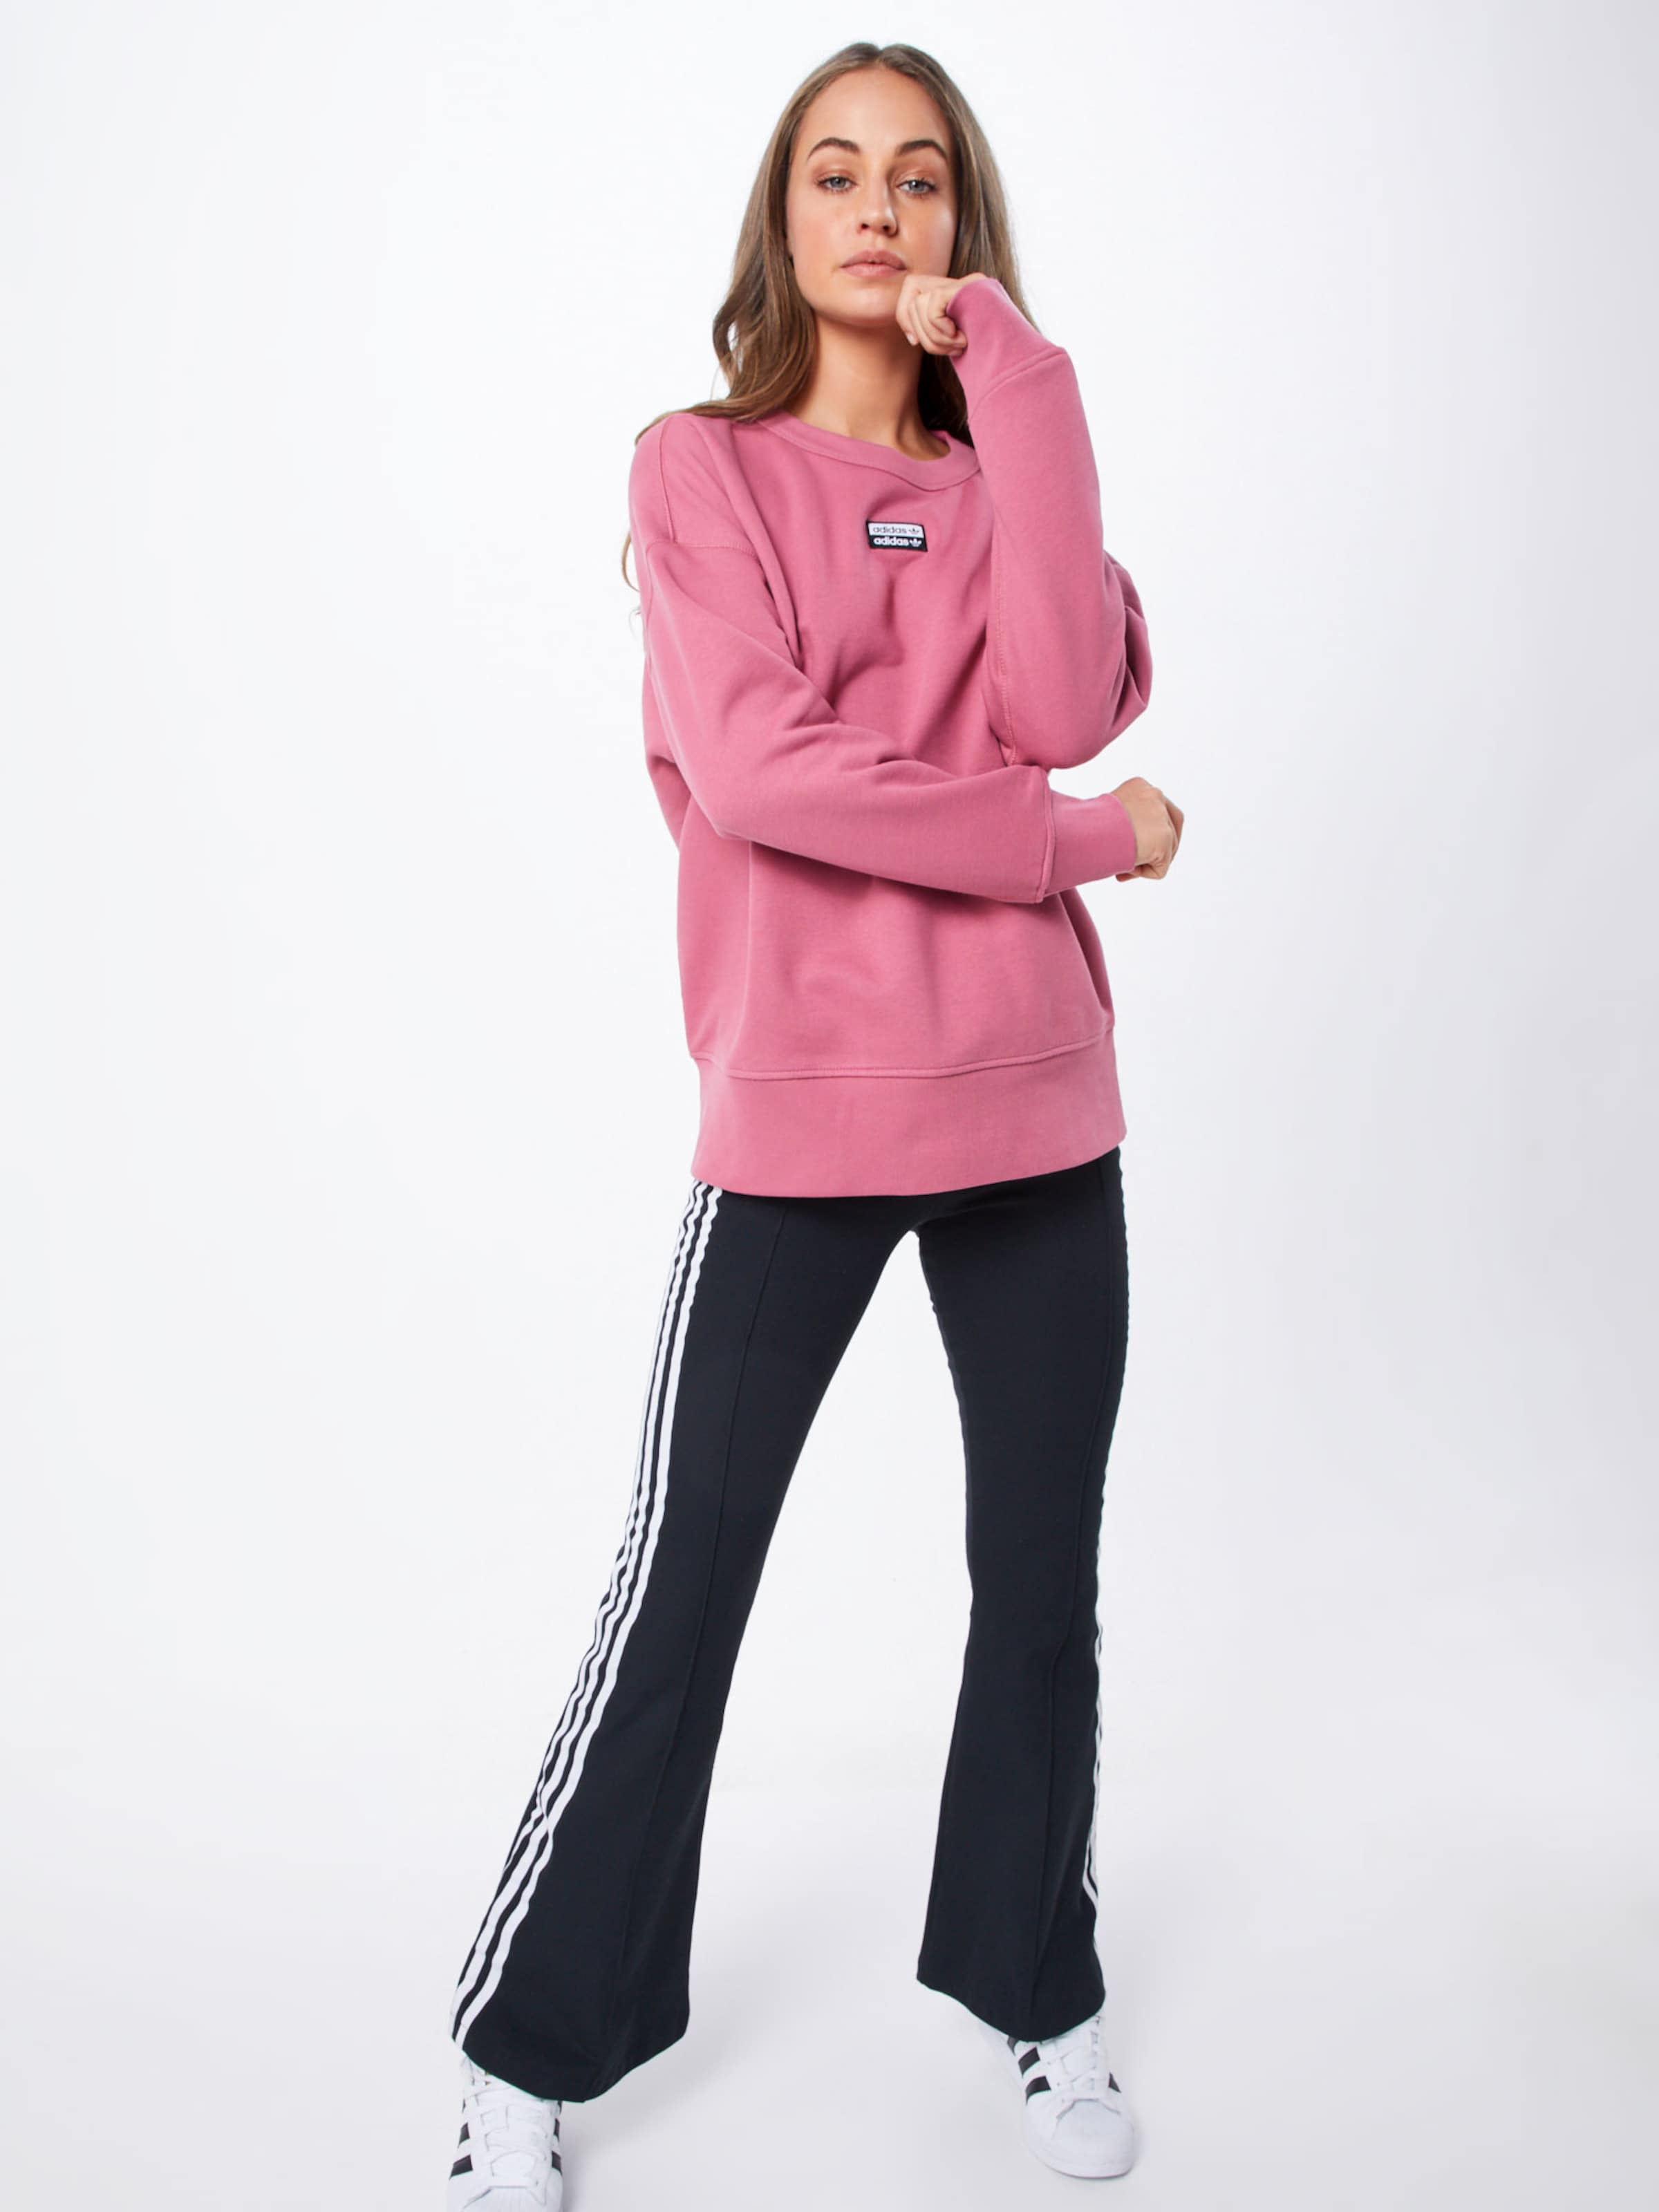 Adidas En shirt Sweat 'vocal' Rose Ancienne Originals TF3Kl51cuJ